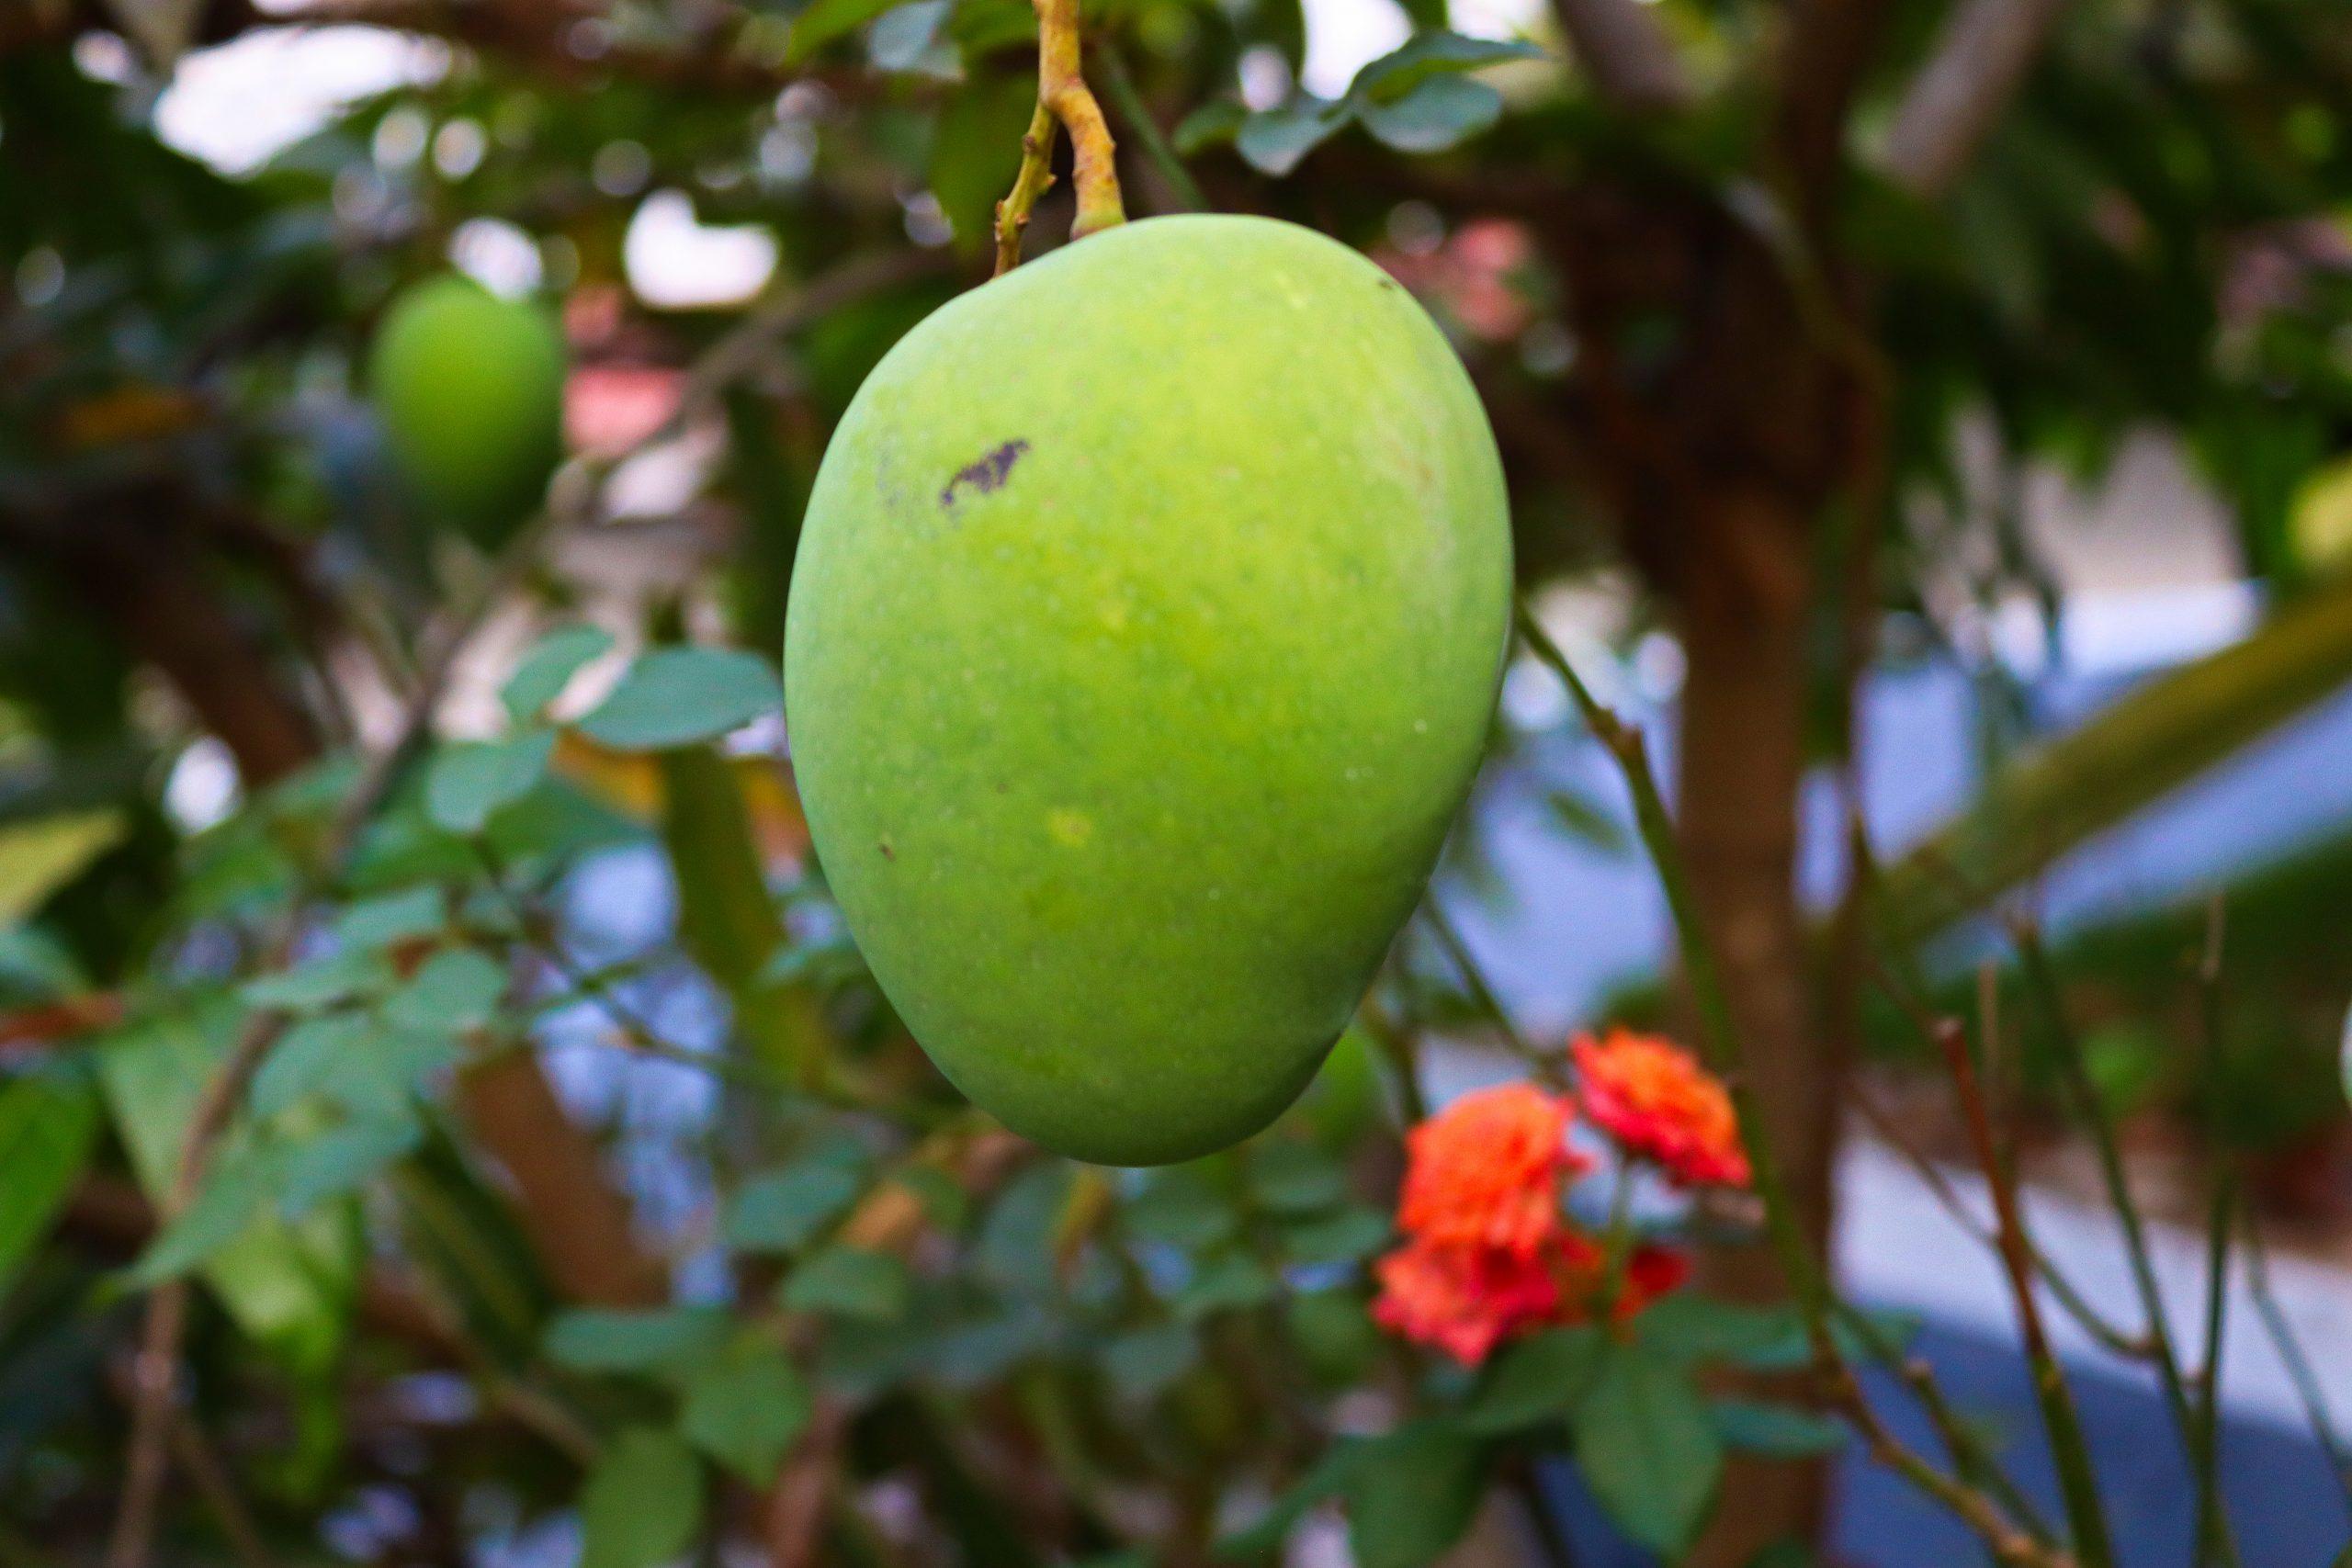 A hanging mango